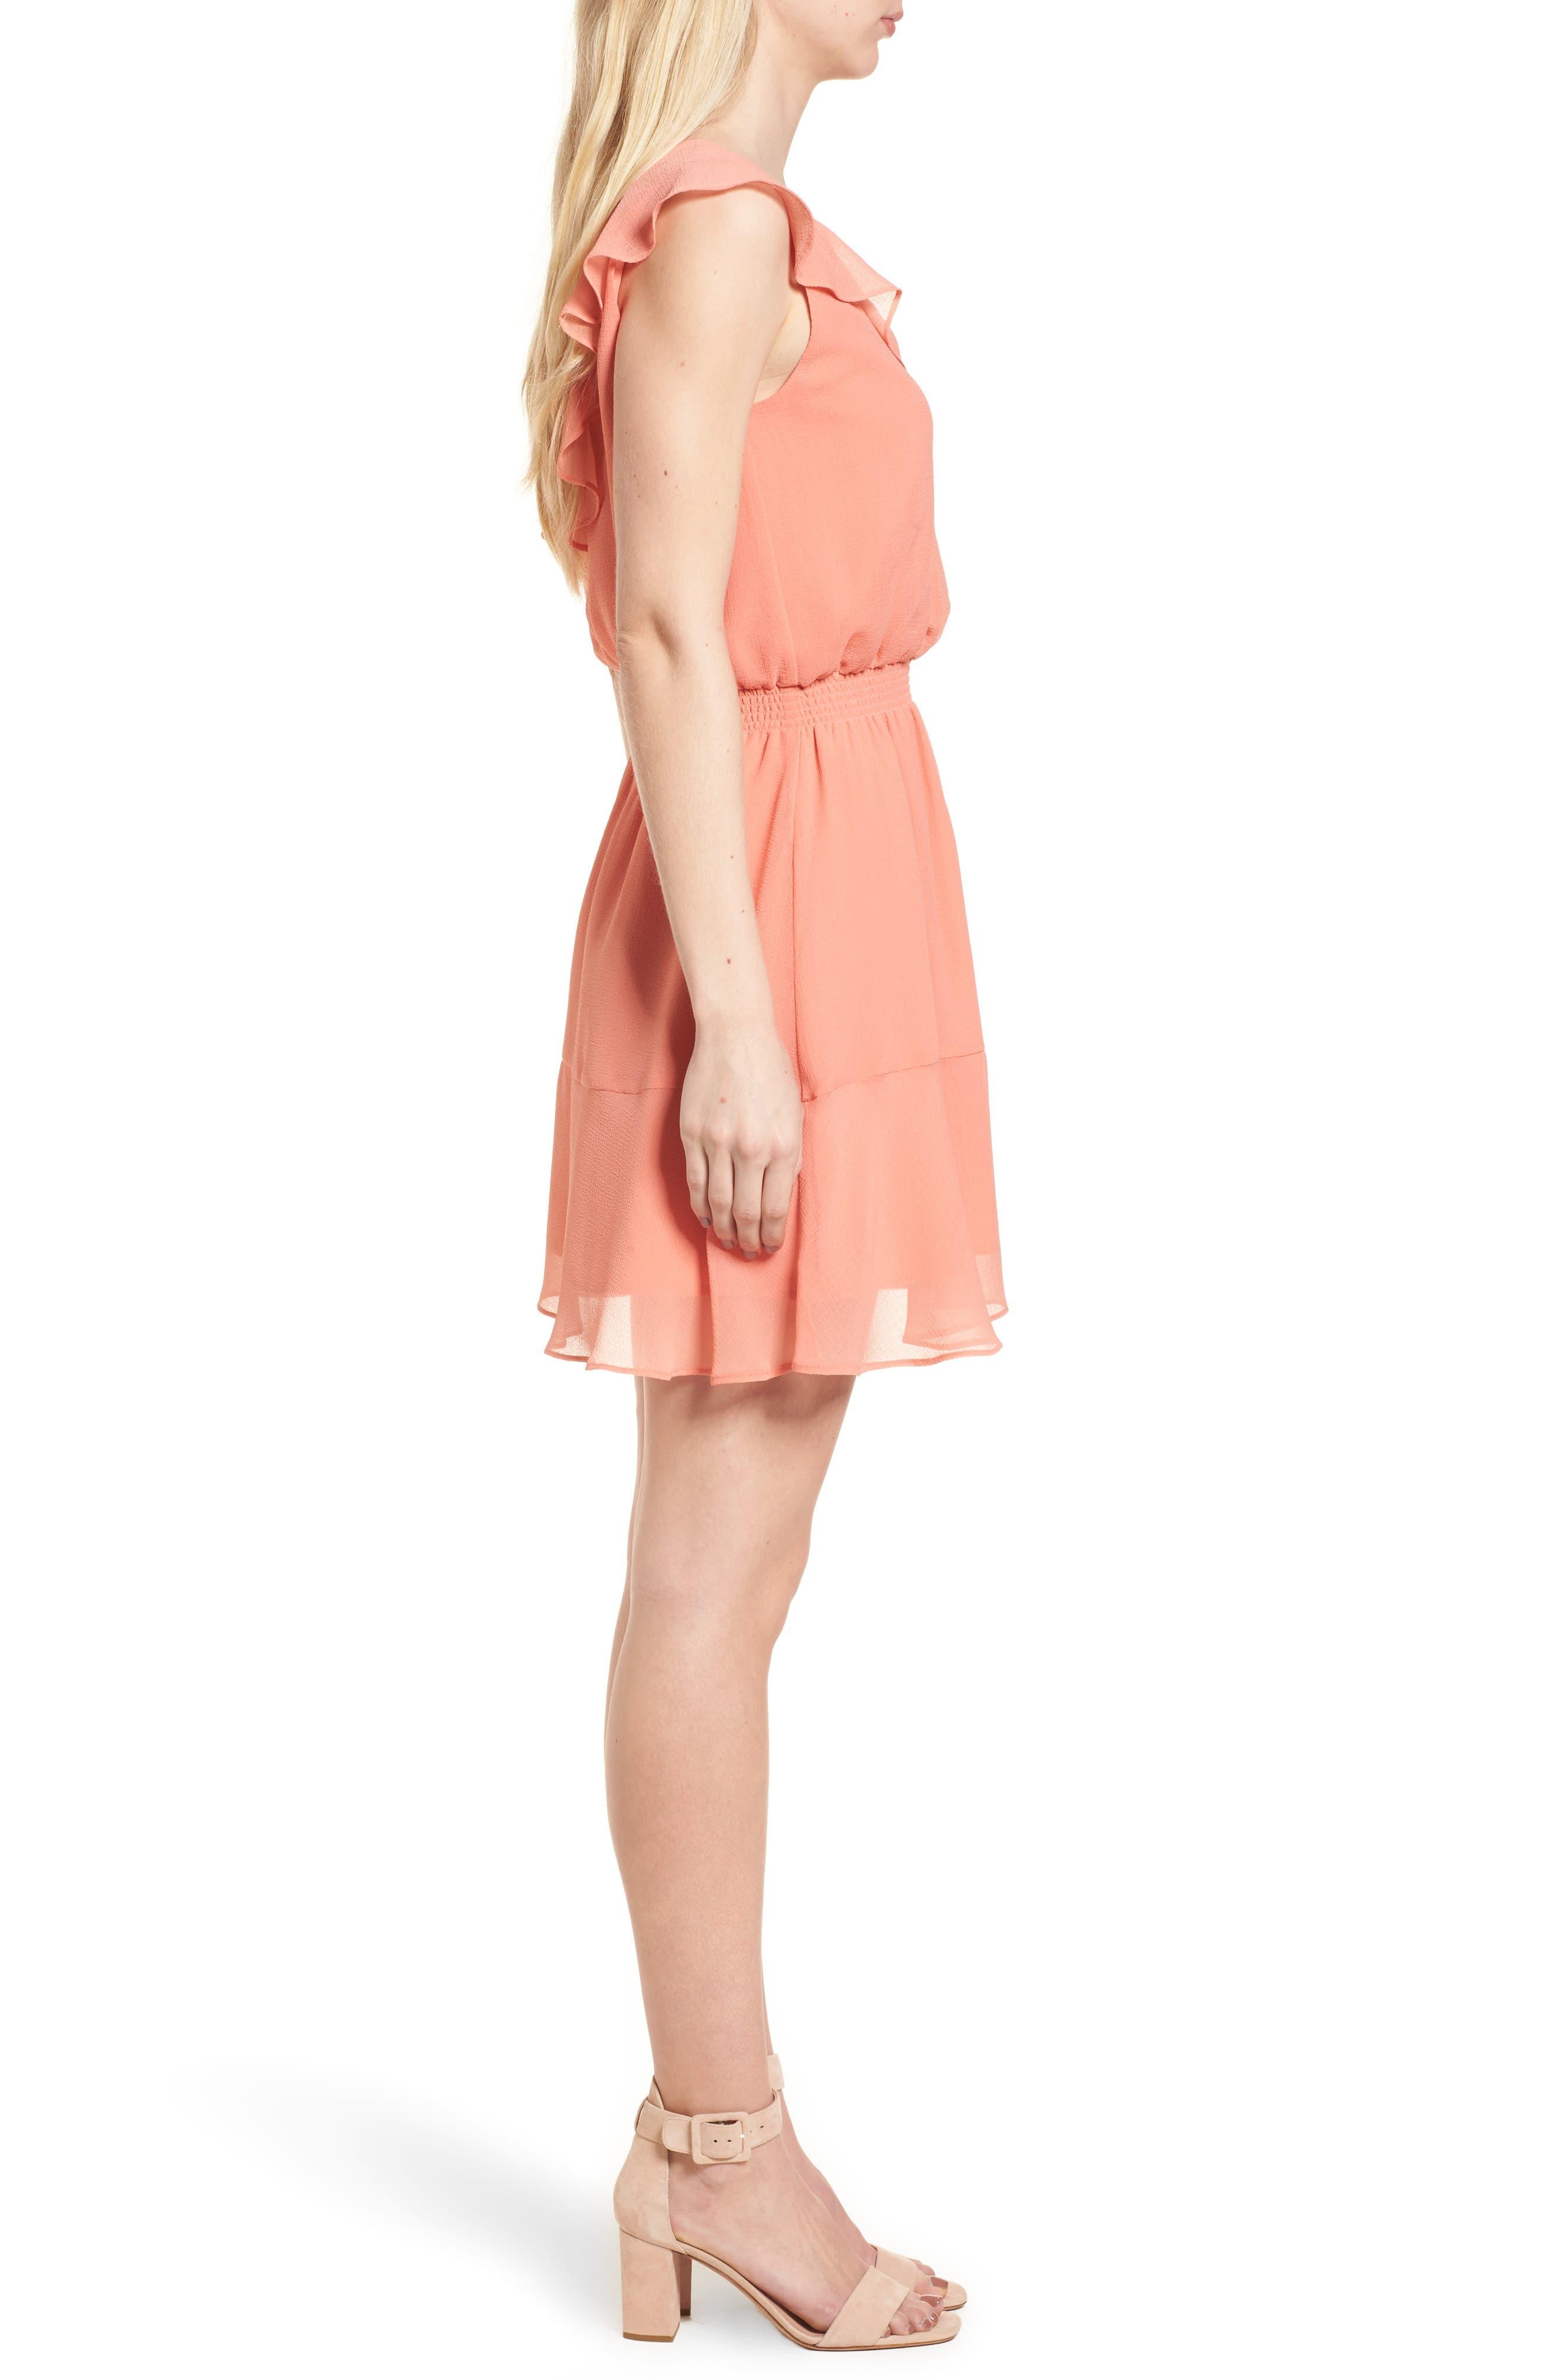 Iniko Blouson Dress,                             Alternate thumbnail 3, color,                             Spring Coral